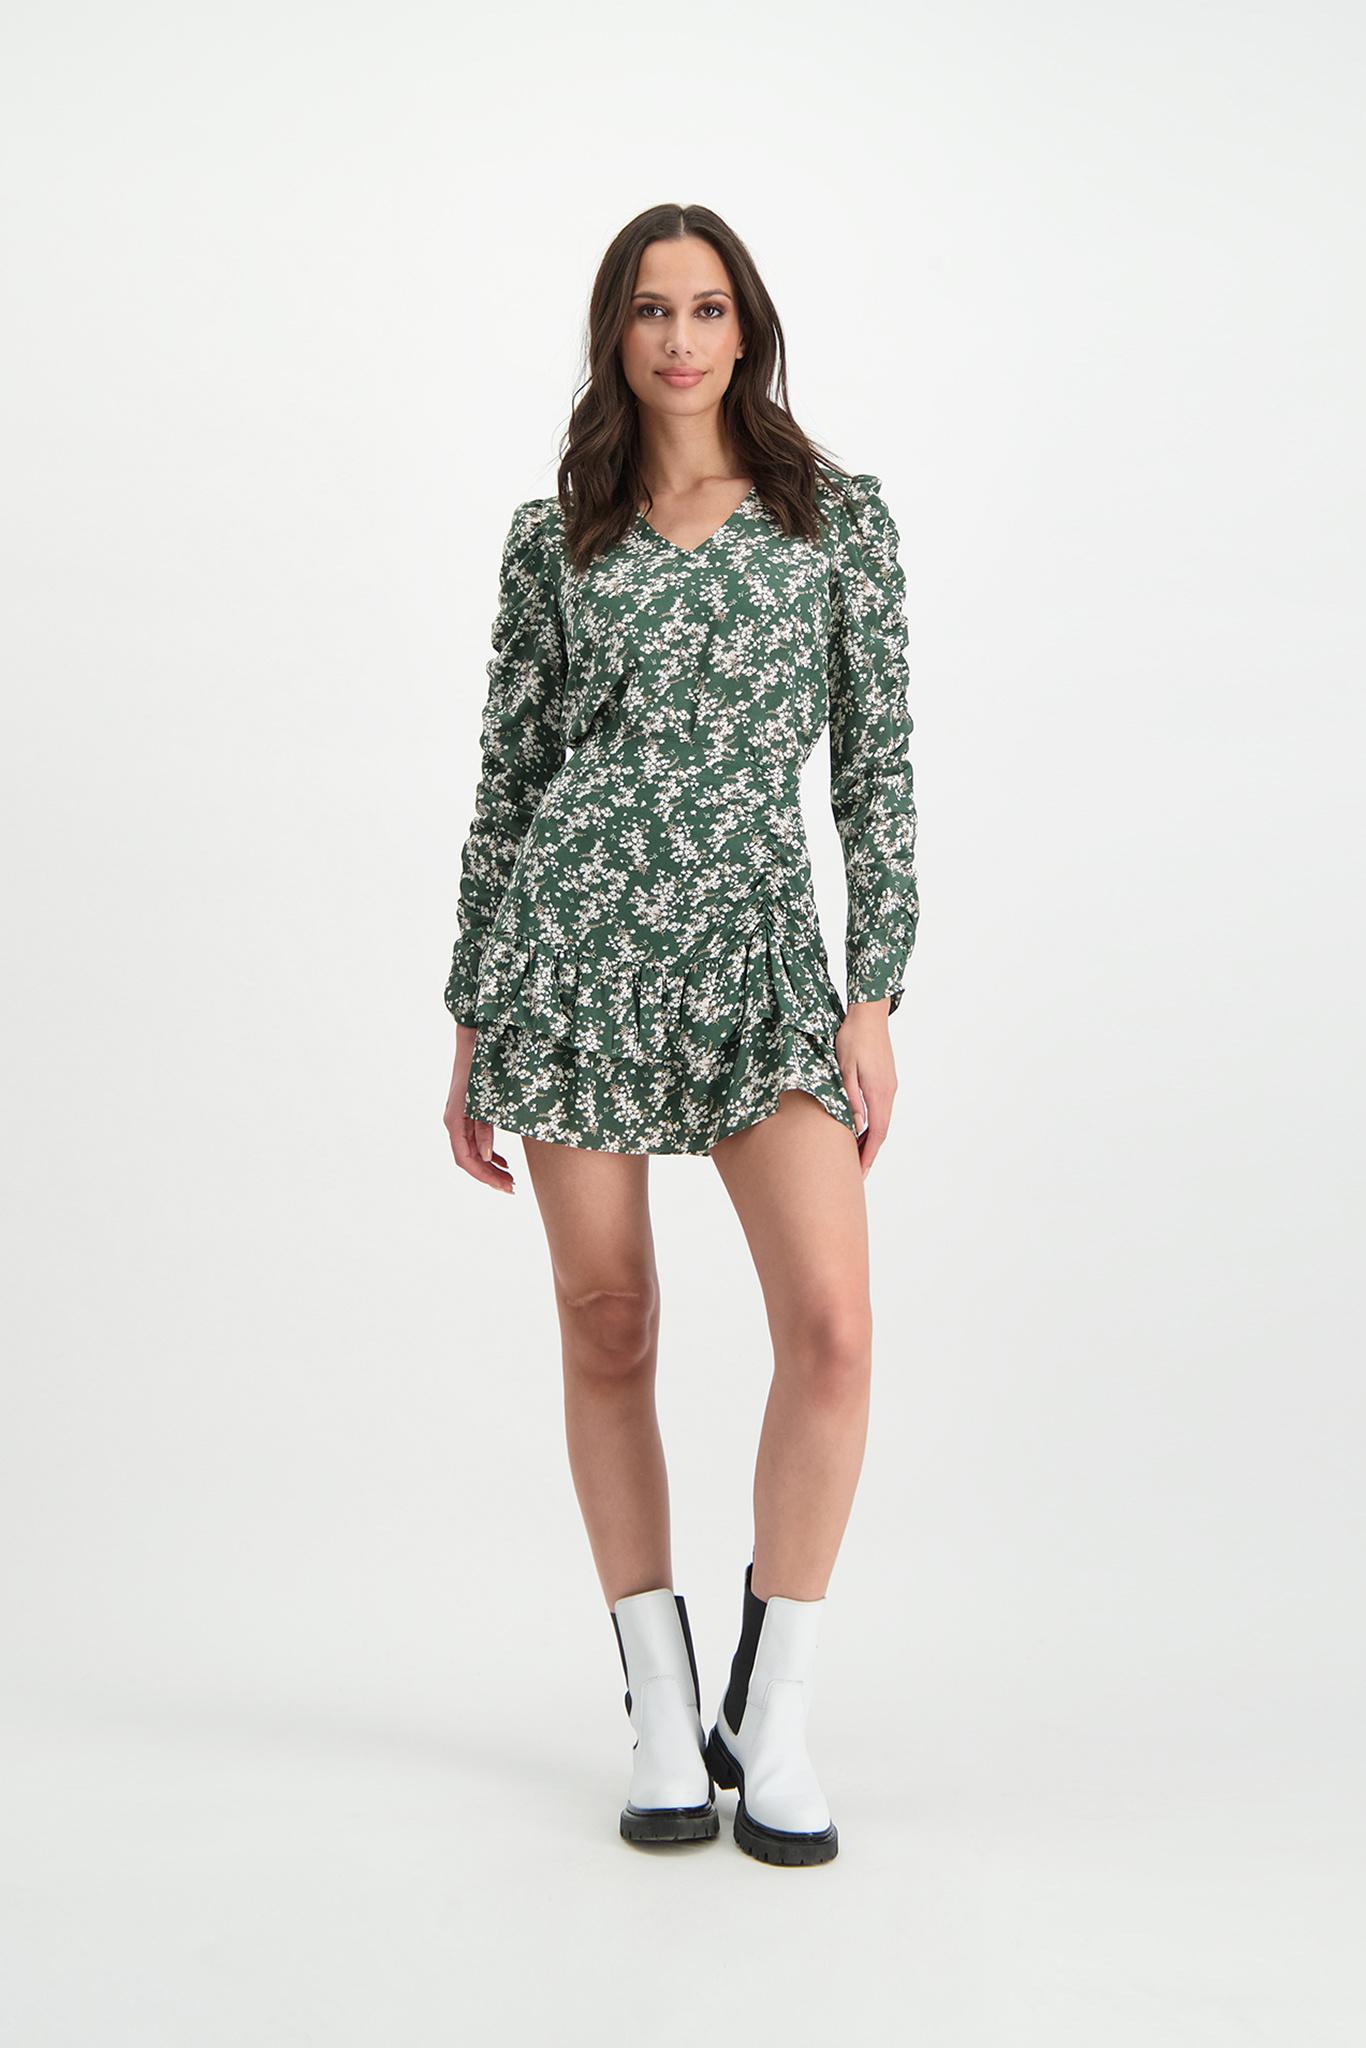 Lofty Manner Green Floral Print Mini Skirt Ciara